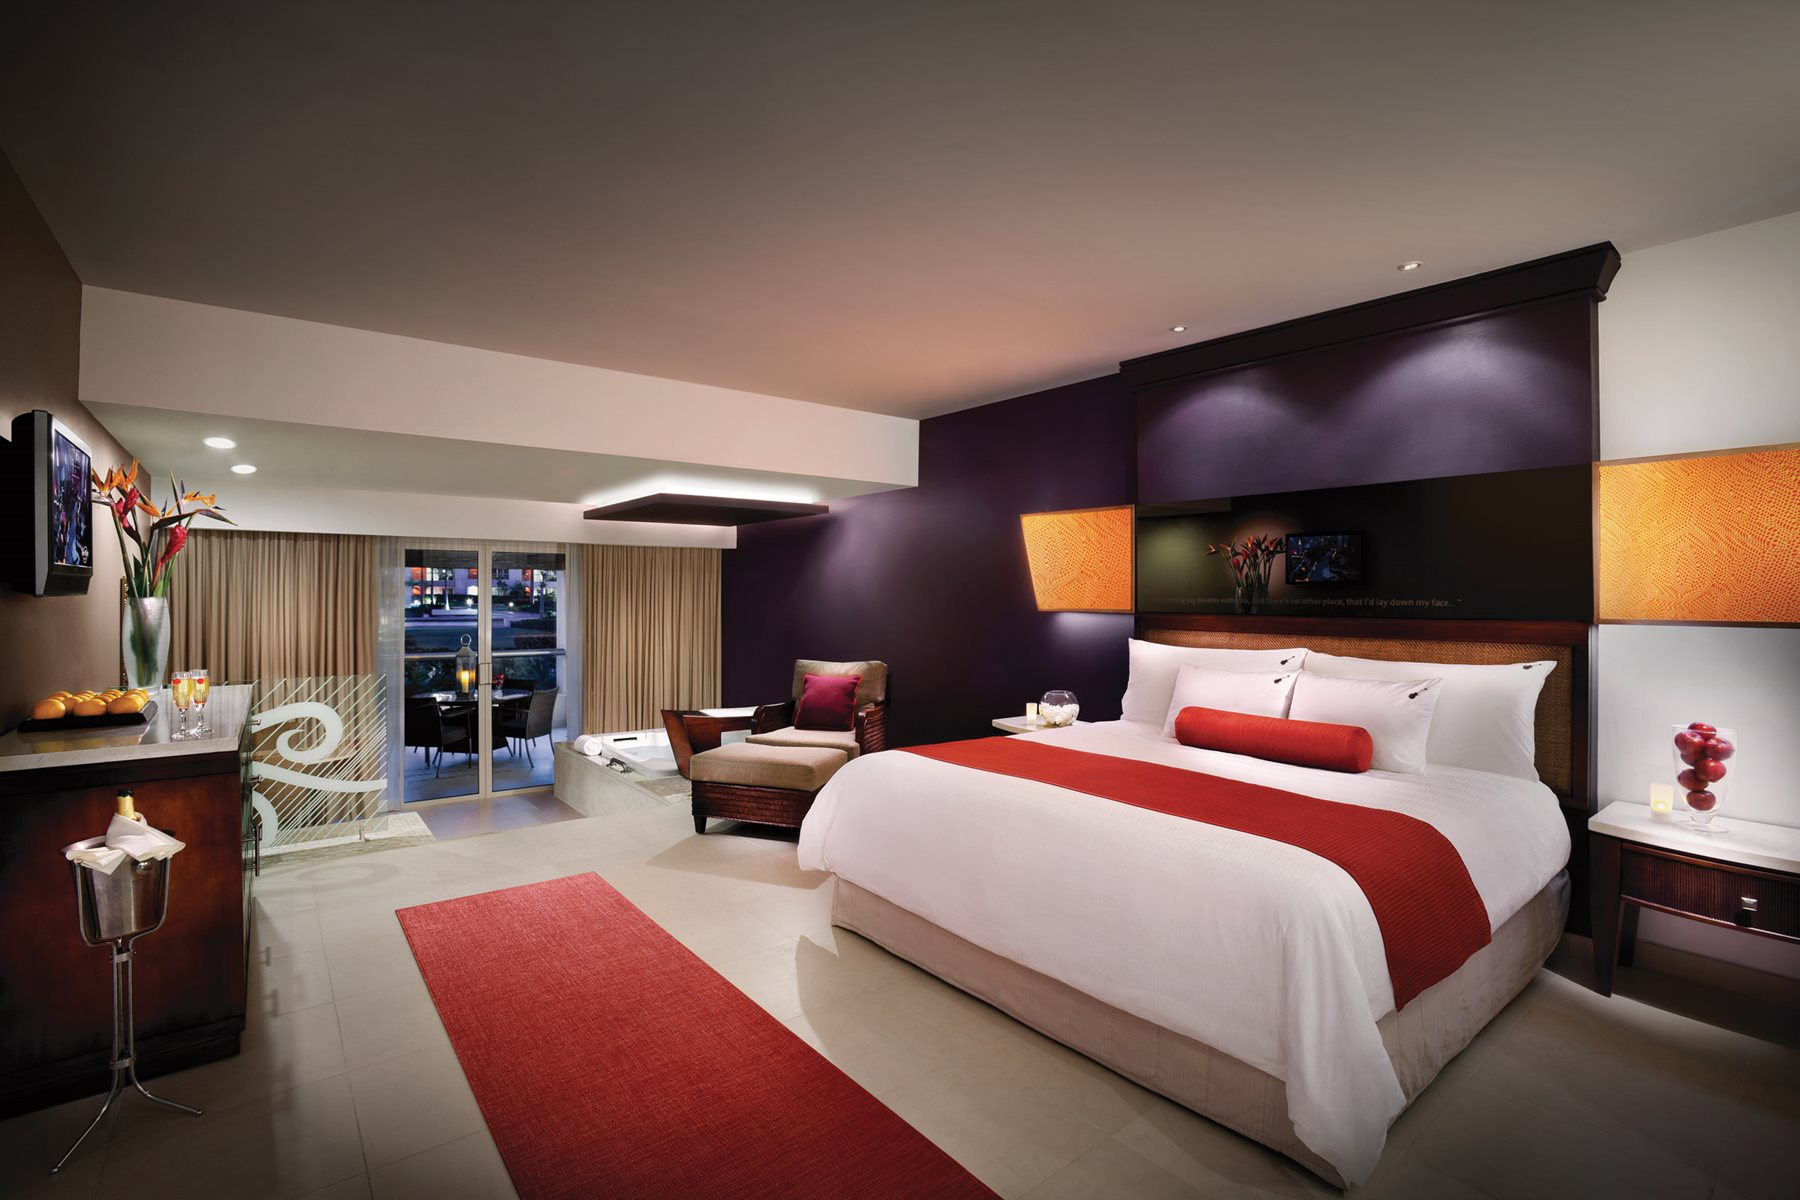 Hard-Rock-Hotel-Casino-Room-016-Islander-Junior-Suite